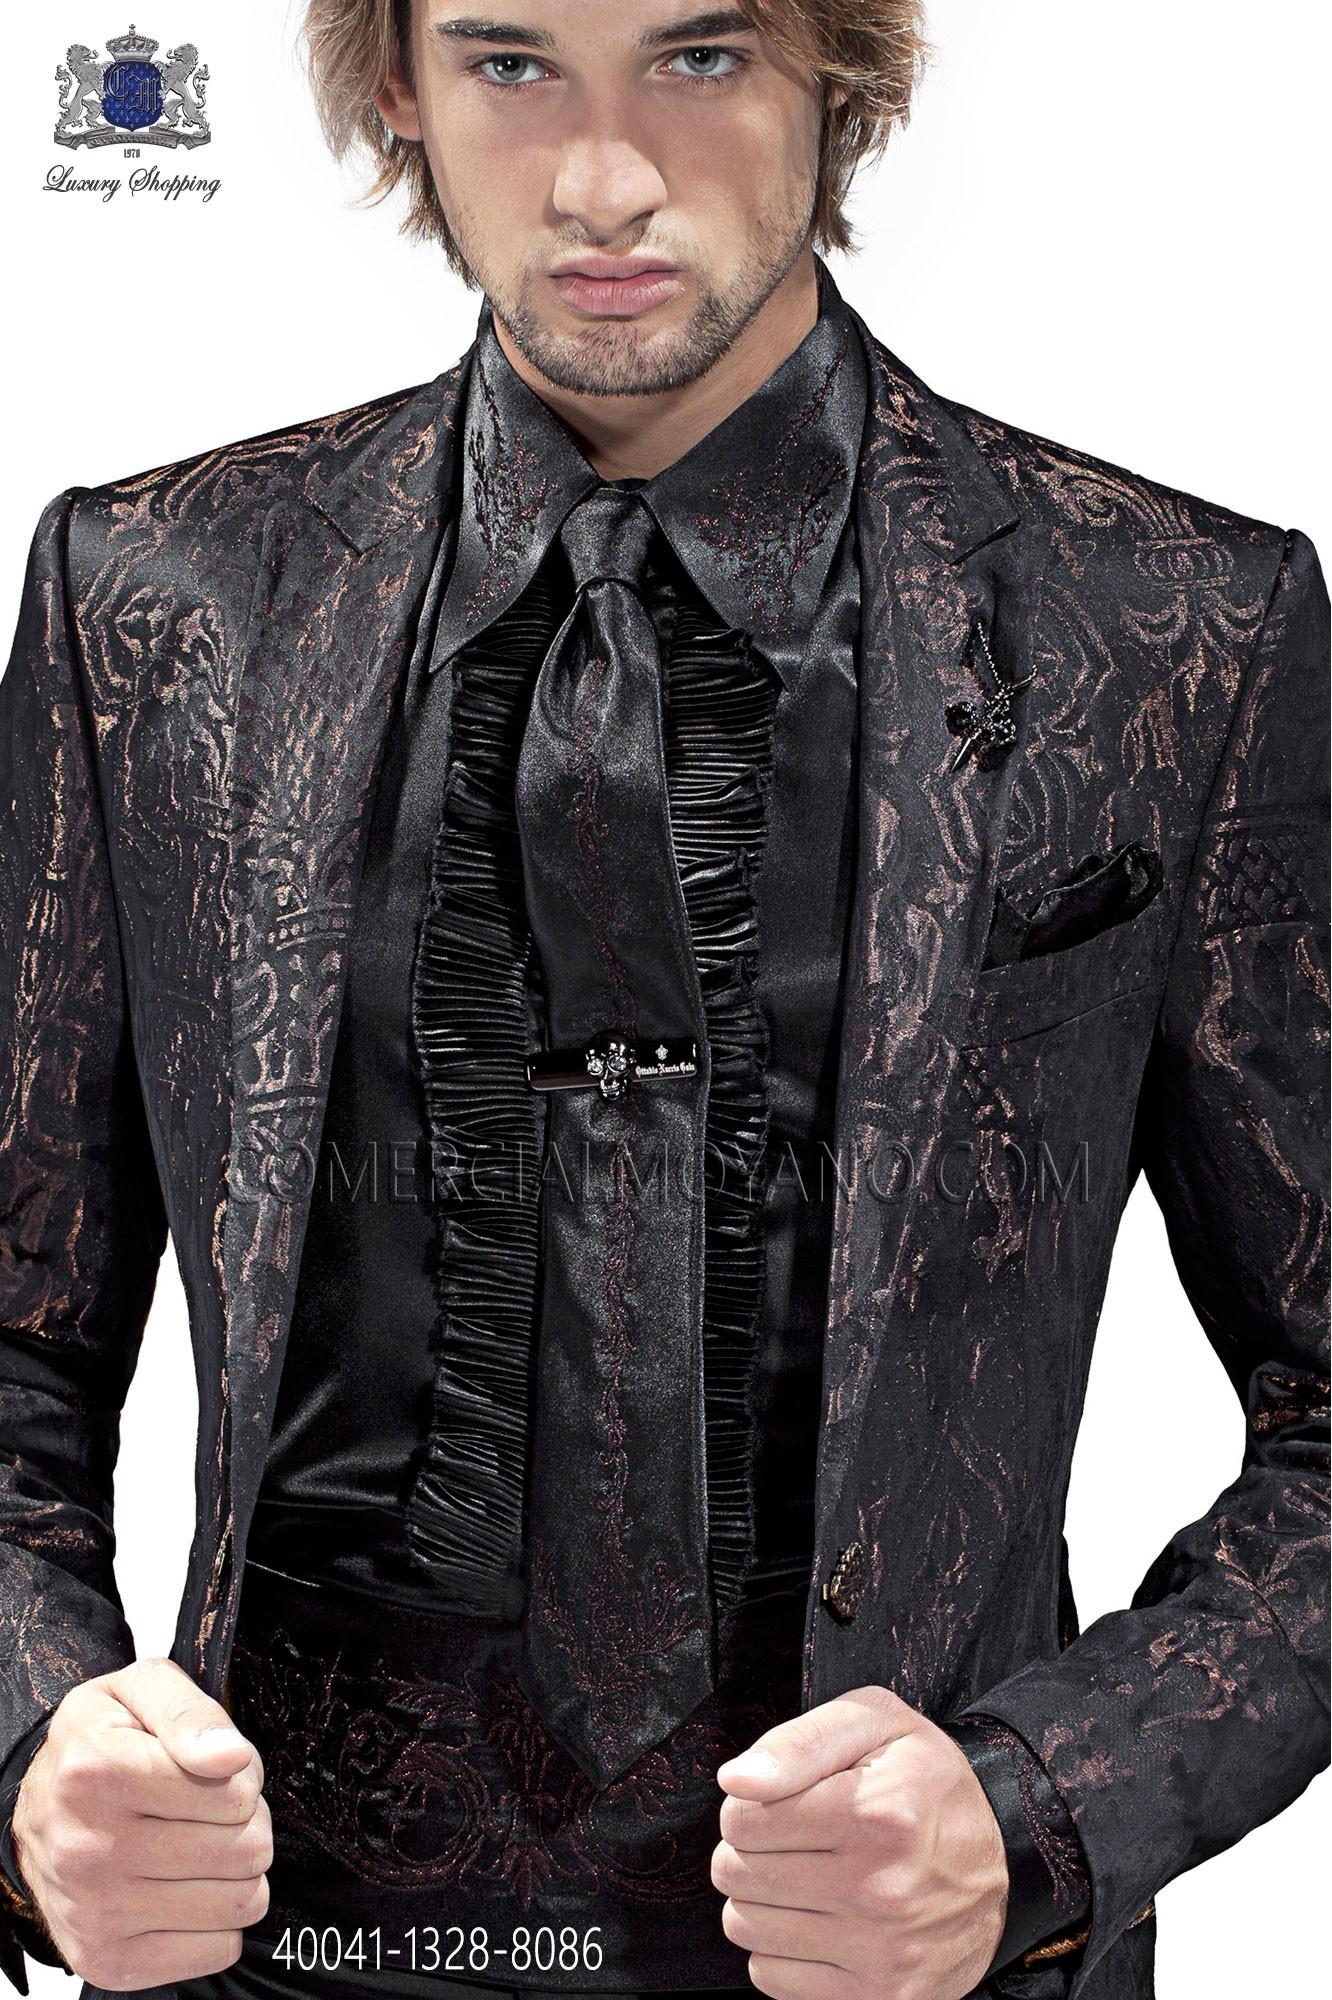 f2f7b762ca35 Black satin shirt with bronze drako embroidery 40041-1328-8086 Ottavio  Nuccio Gala. Loading zoom